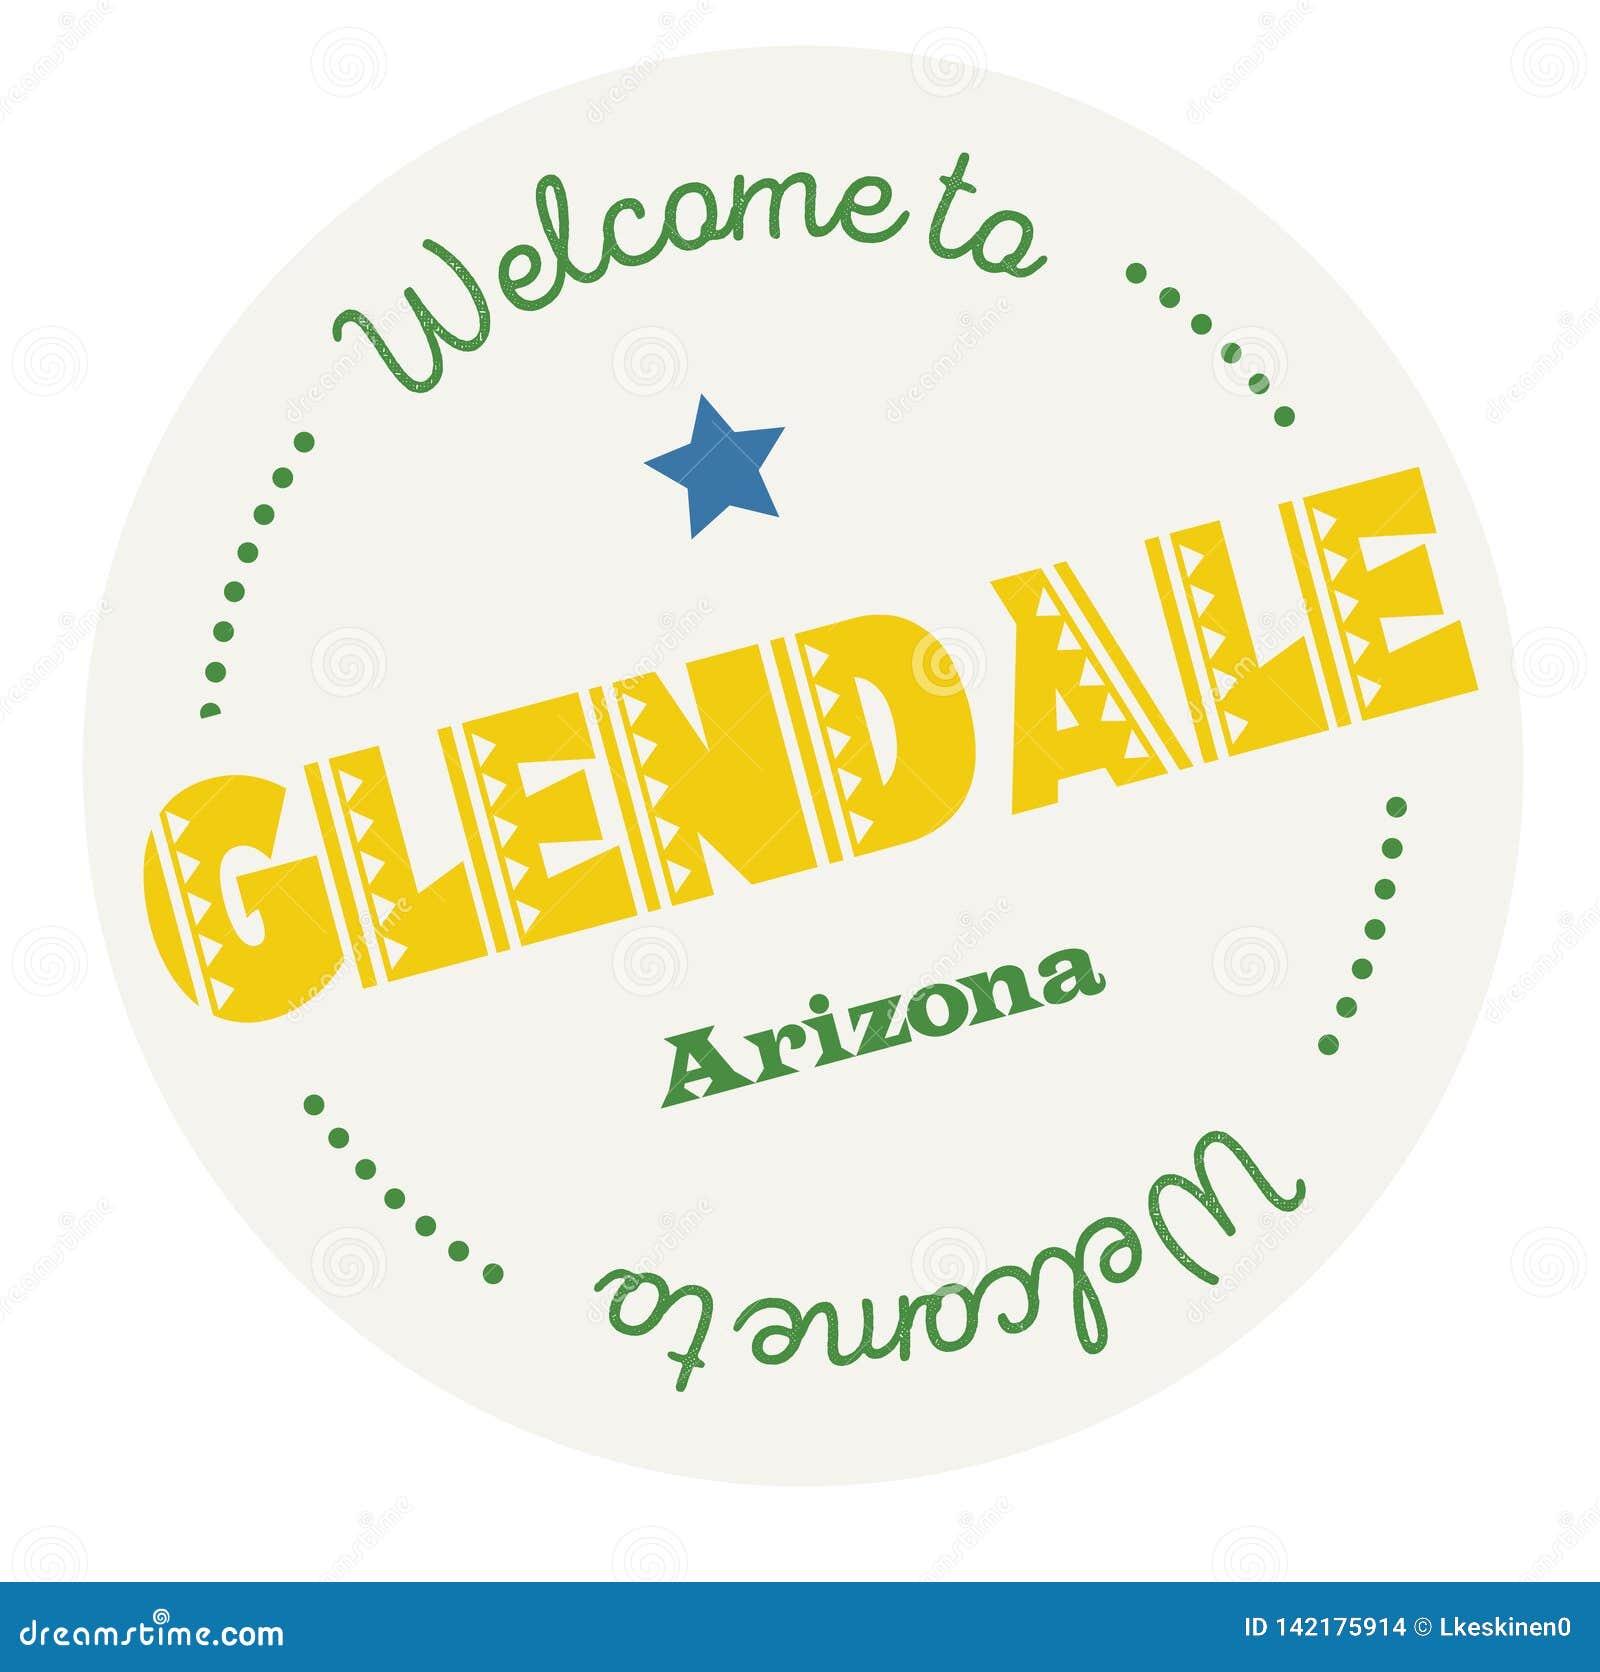 Accueil vers Glendale Arizona